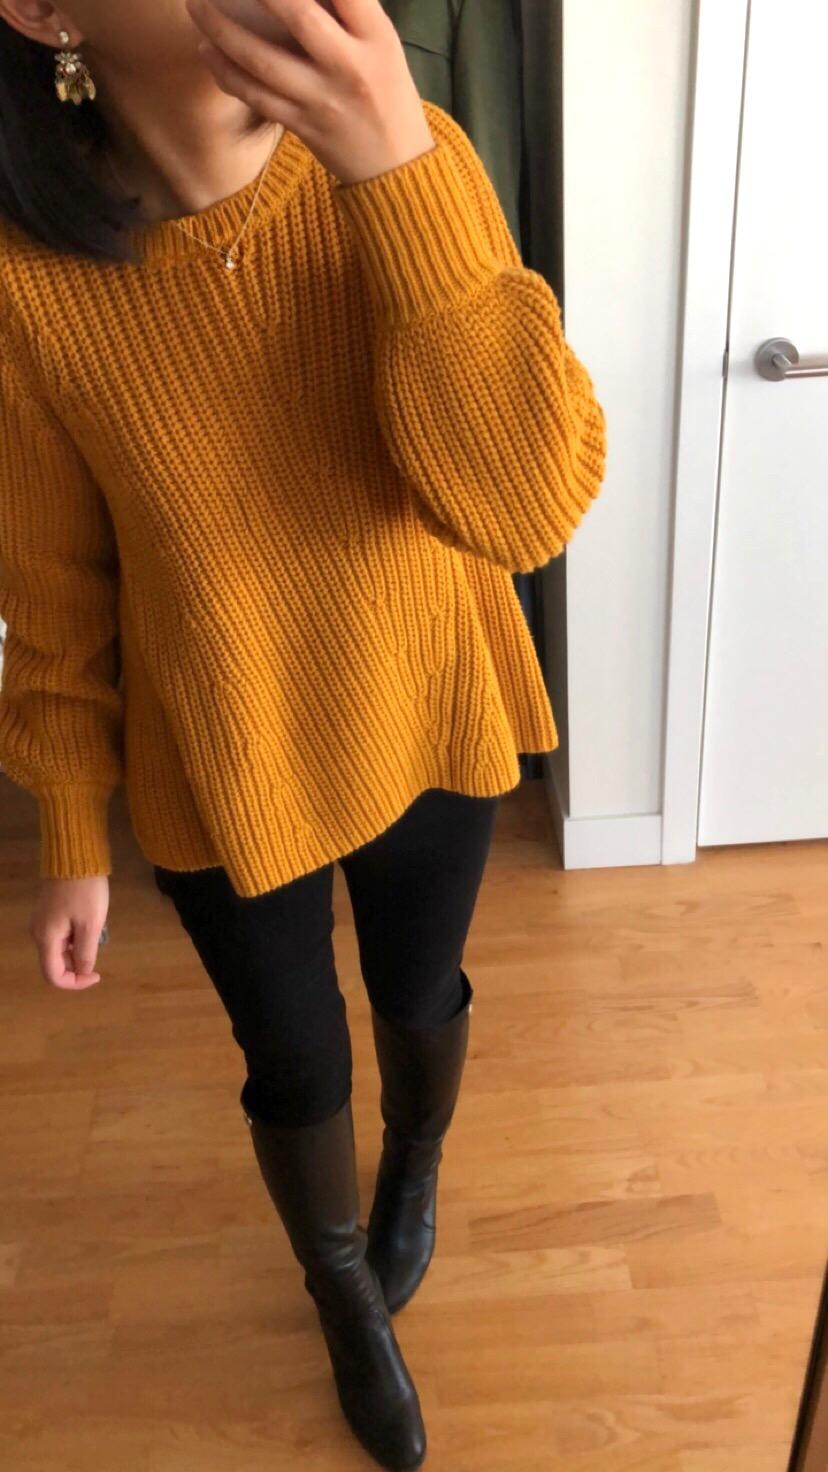 LOFT Mixed Rib Blouson Sleeve Sweater, size XS regular